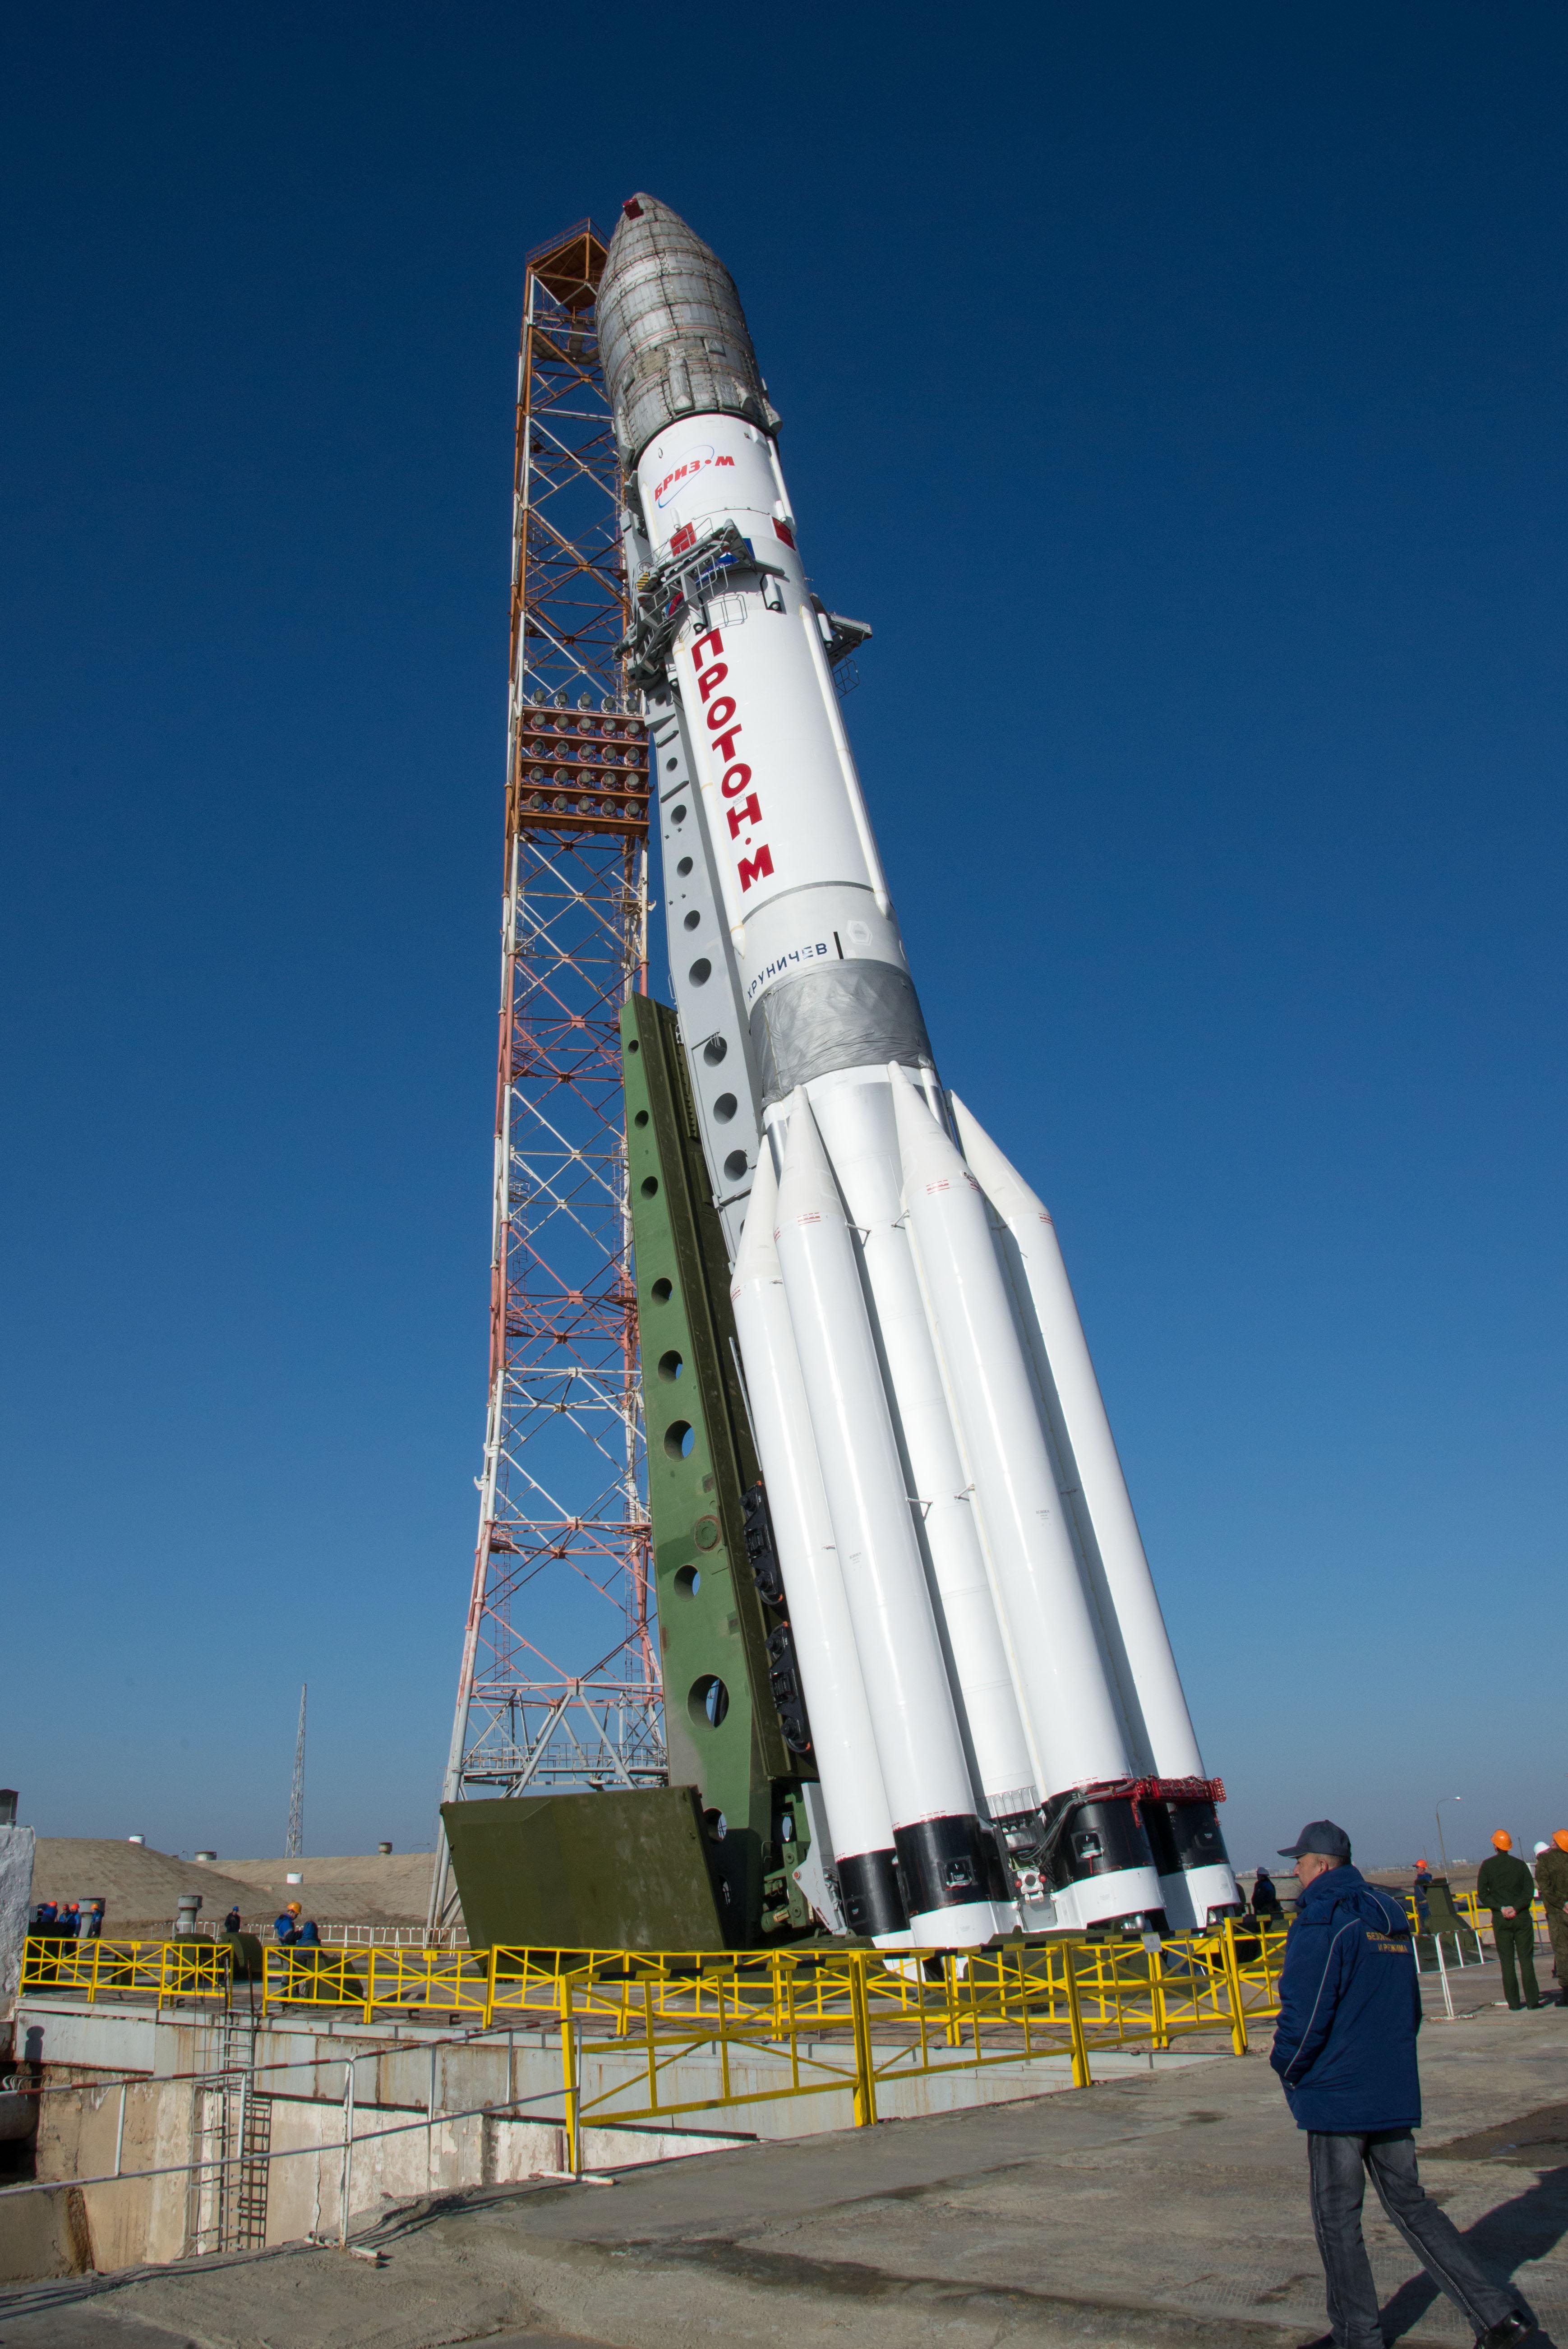 ExoMars2016_proton_launch_pad_160311-LC-